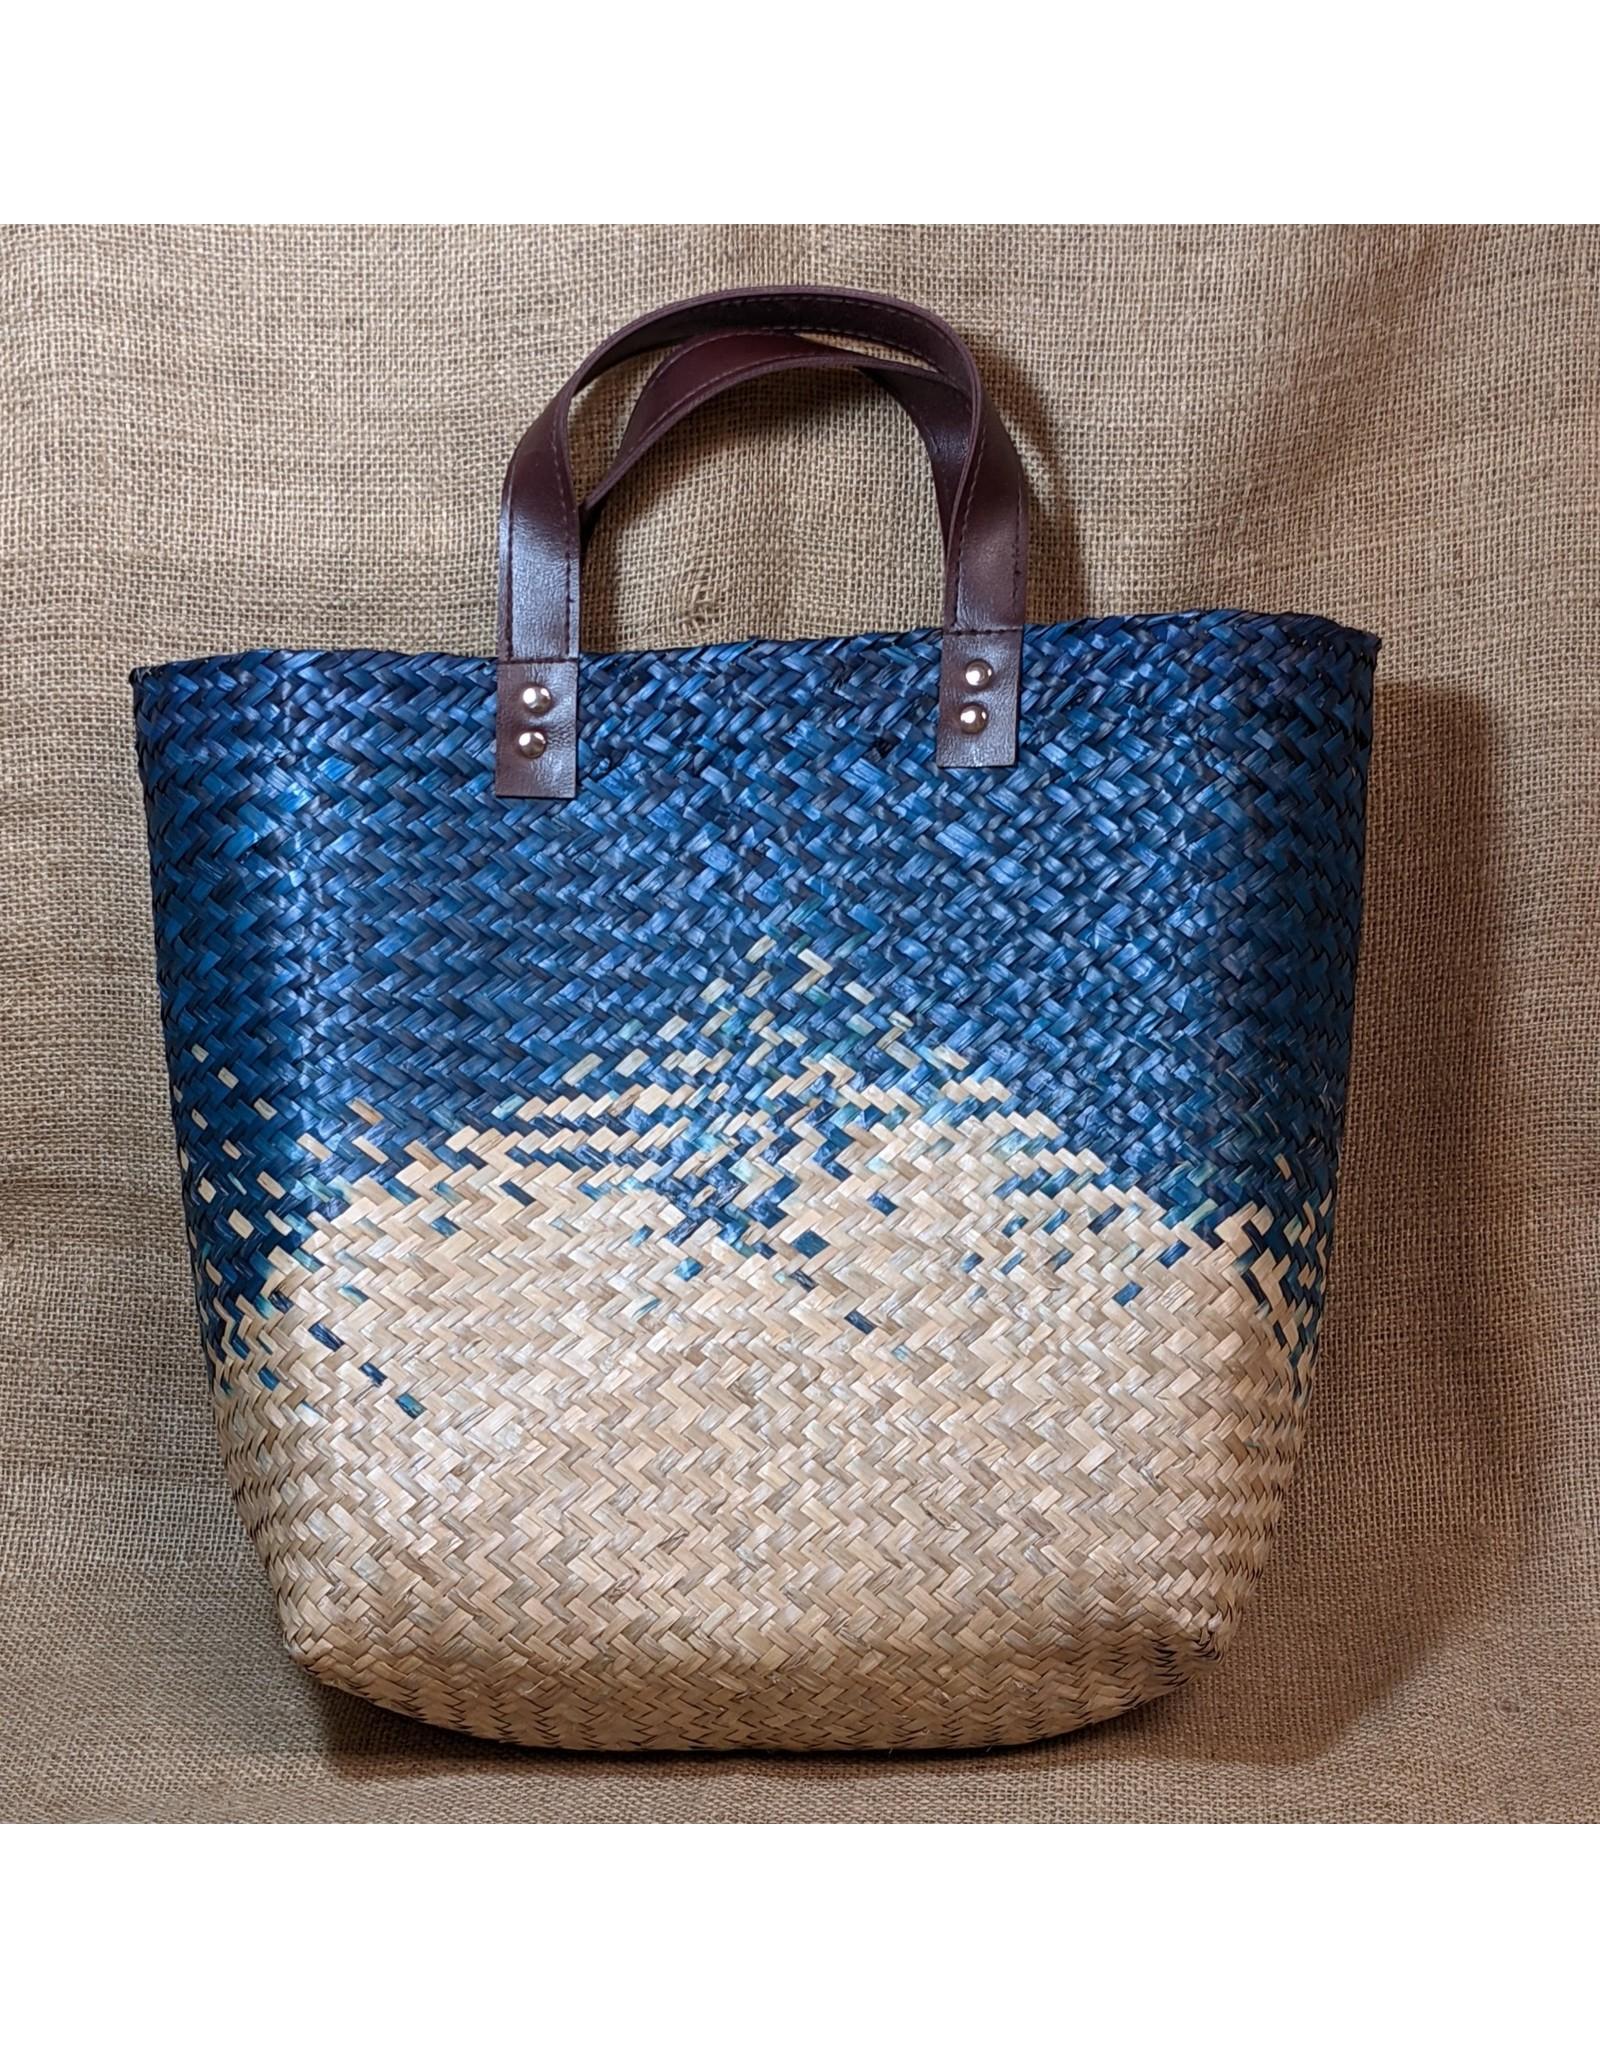 Ten Thousand Villages Navy Seagrass Bag